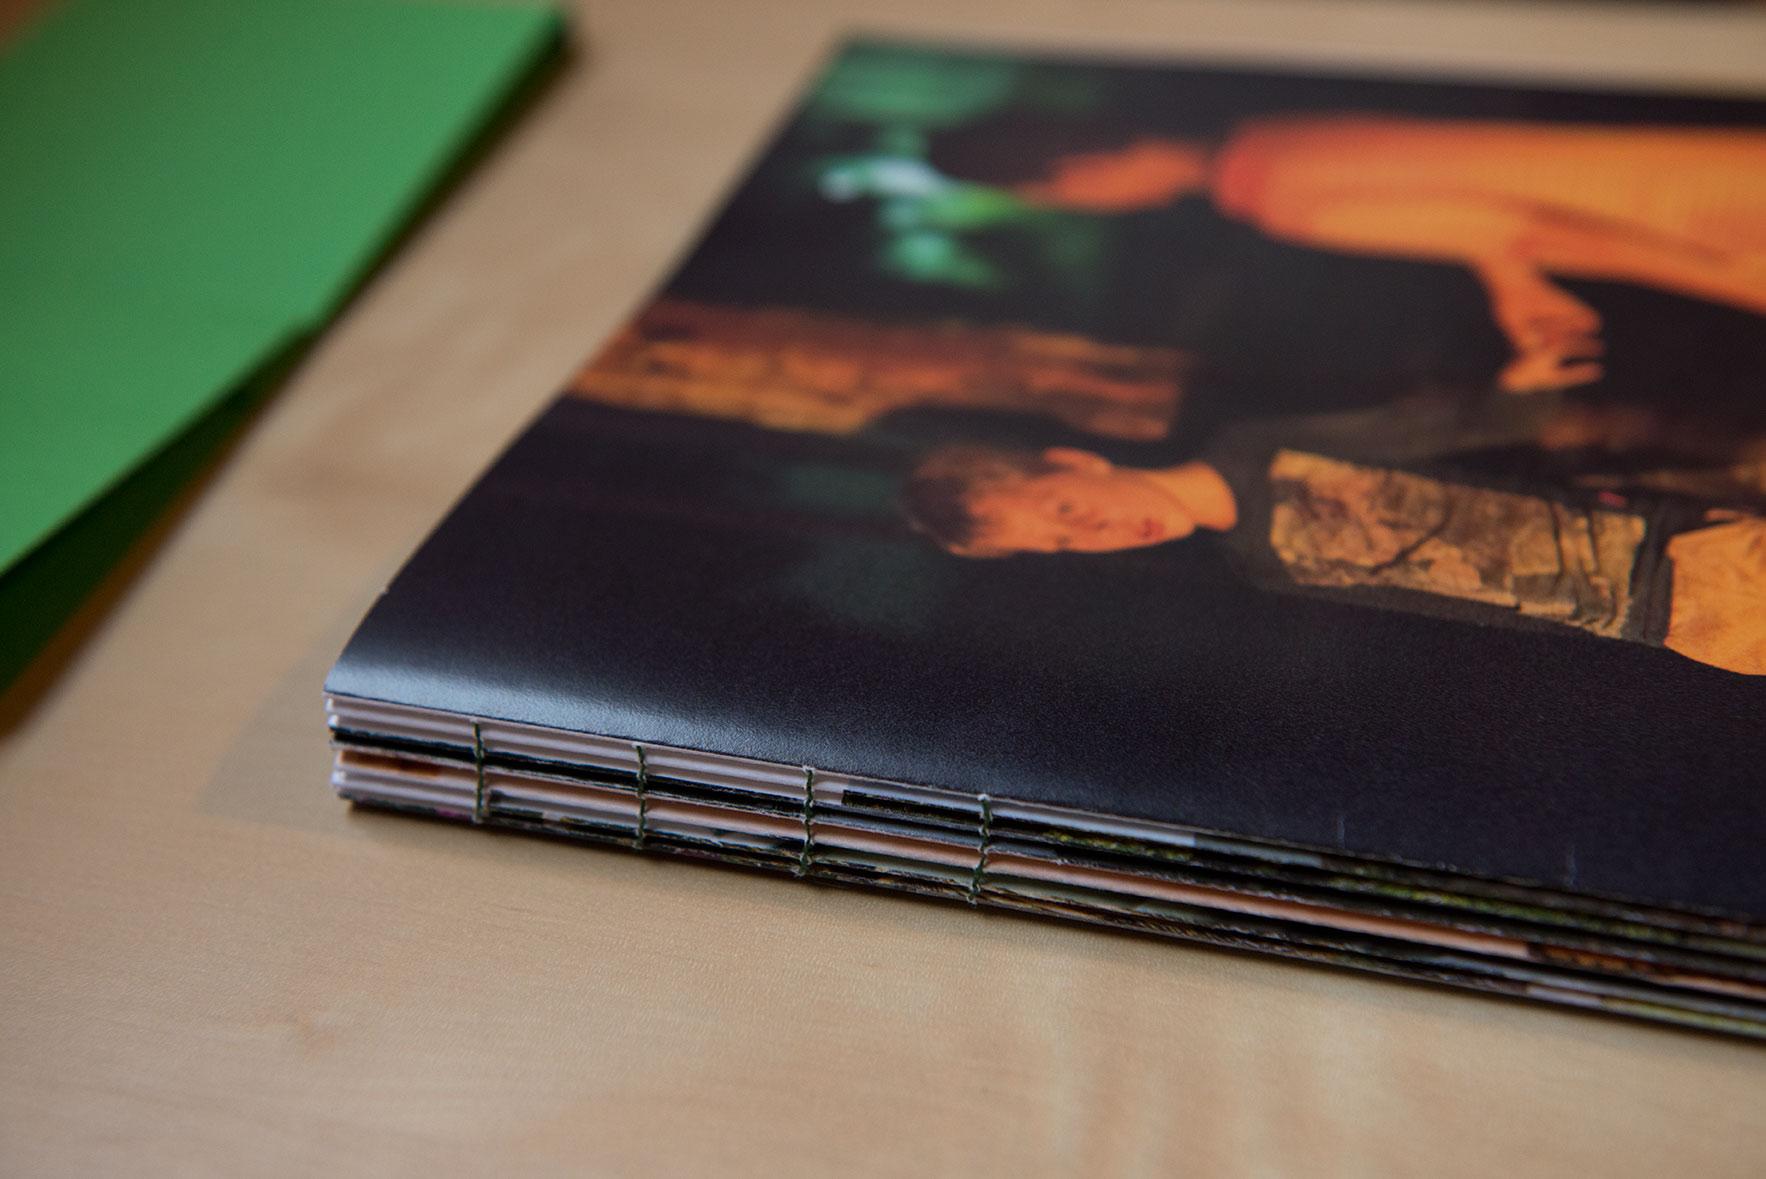 Bookpreview02-©-TomasBachot.jpg